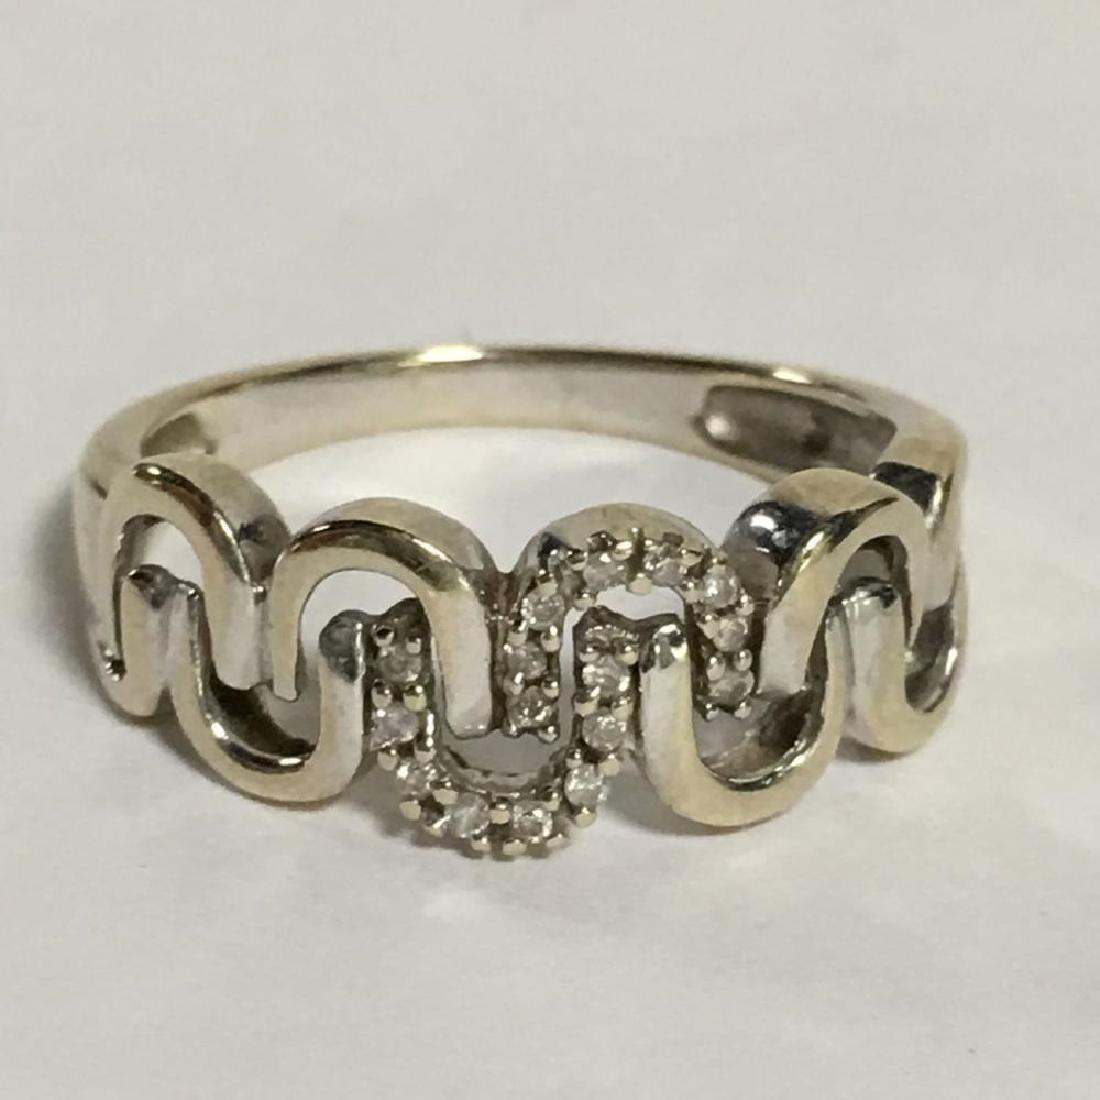 14K White Gold & Diamond Ring, Marked 14K, 1.9DW, size